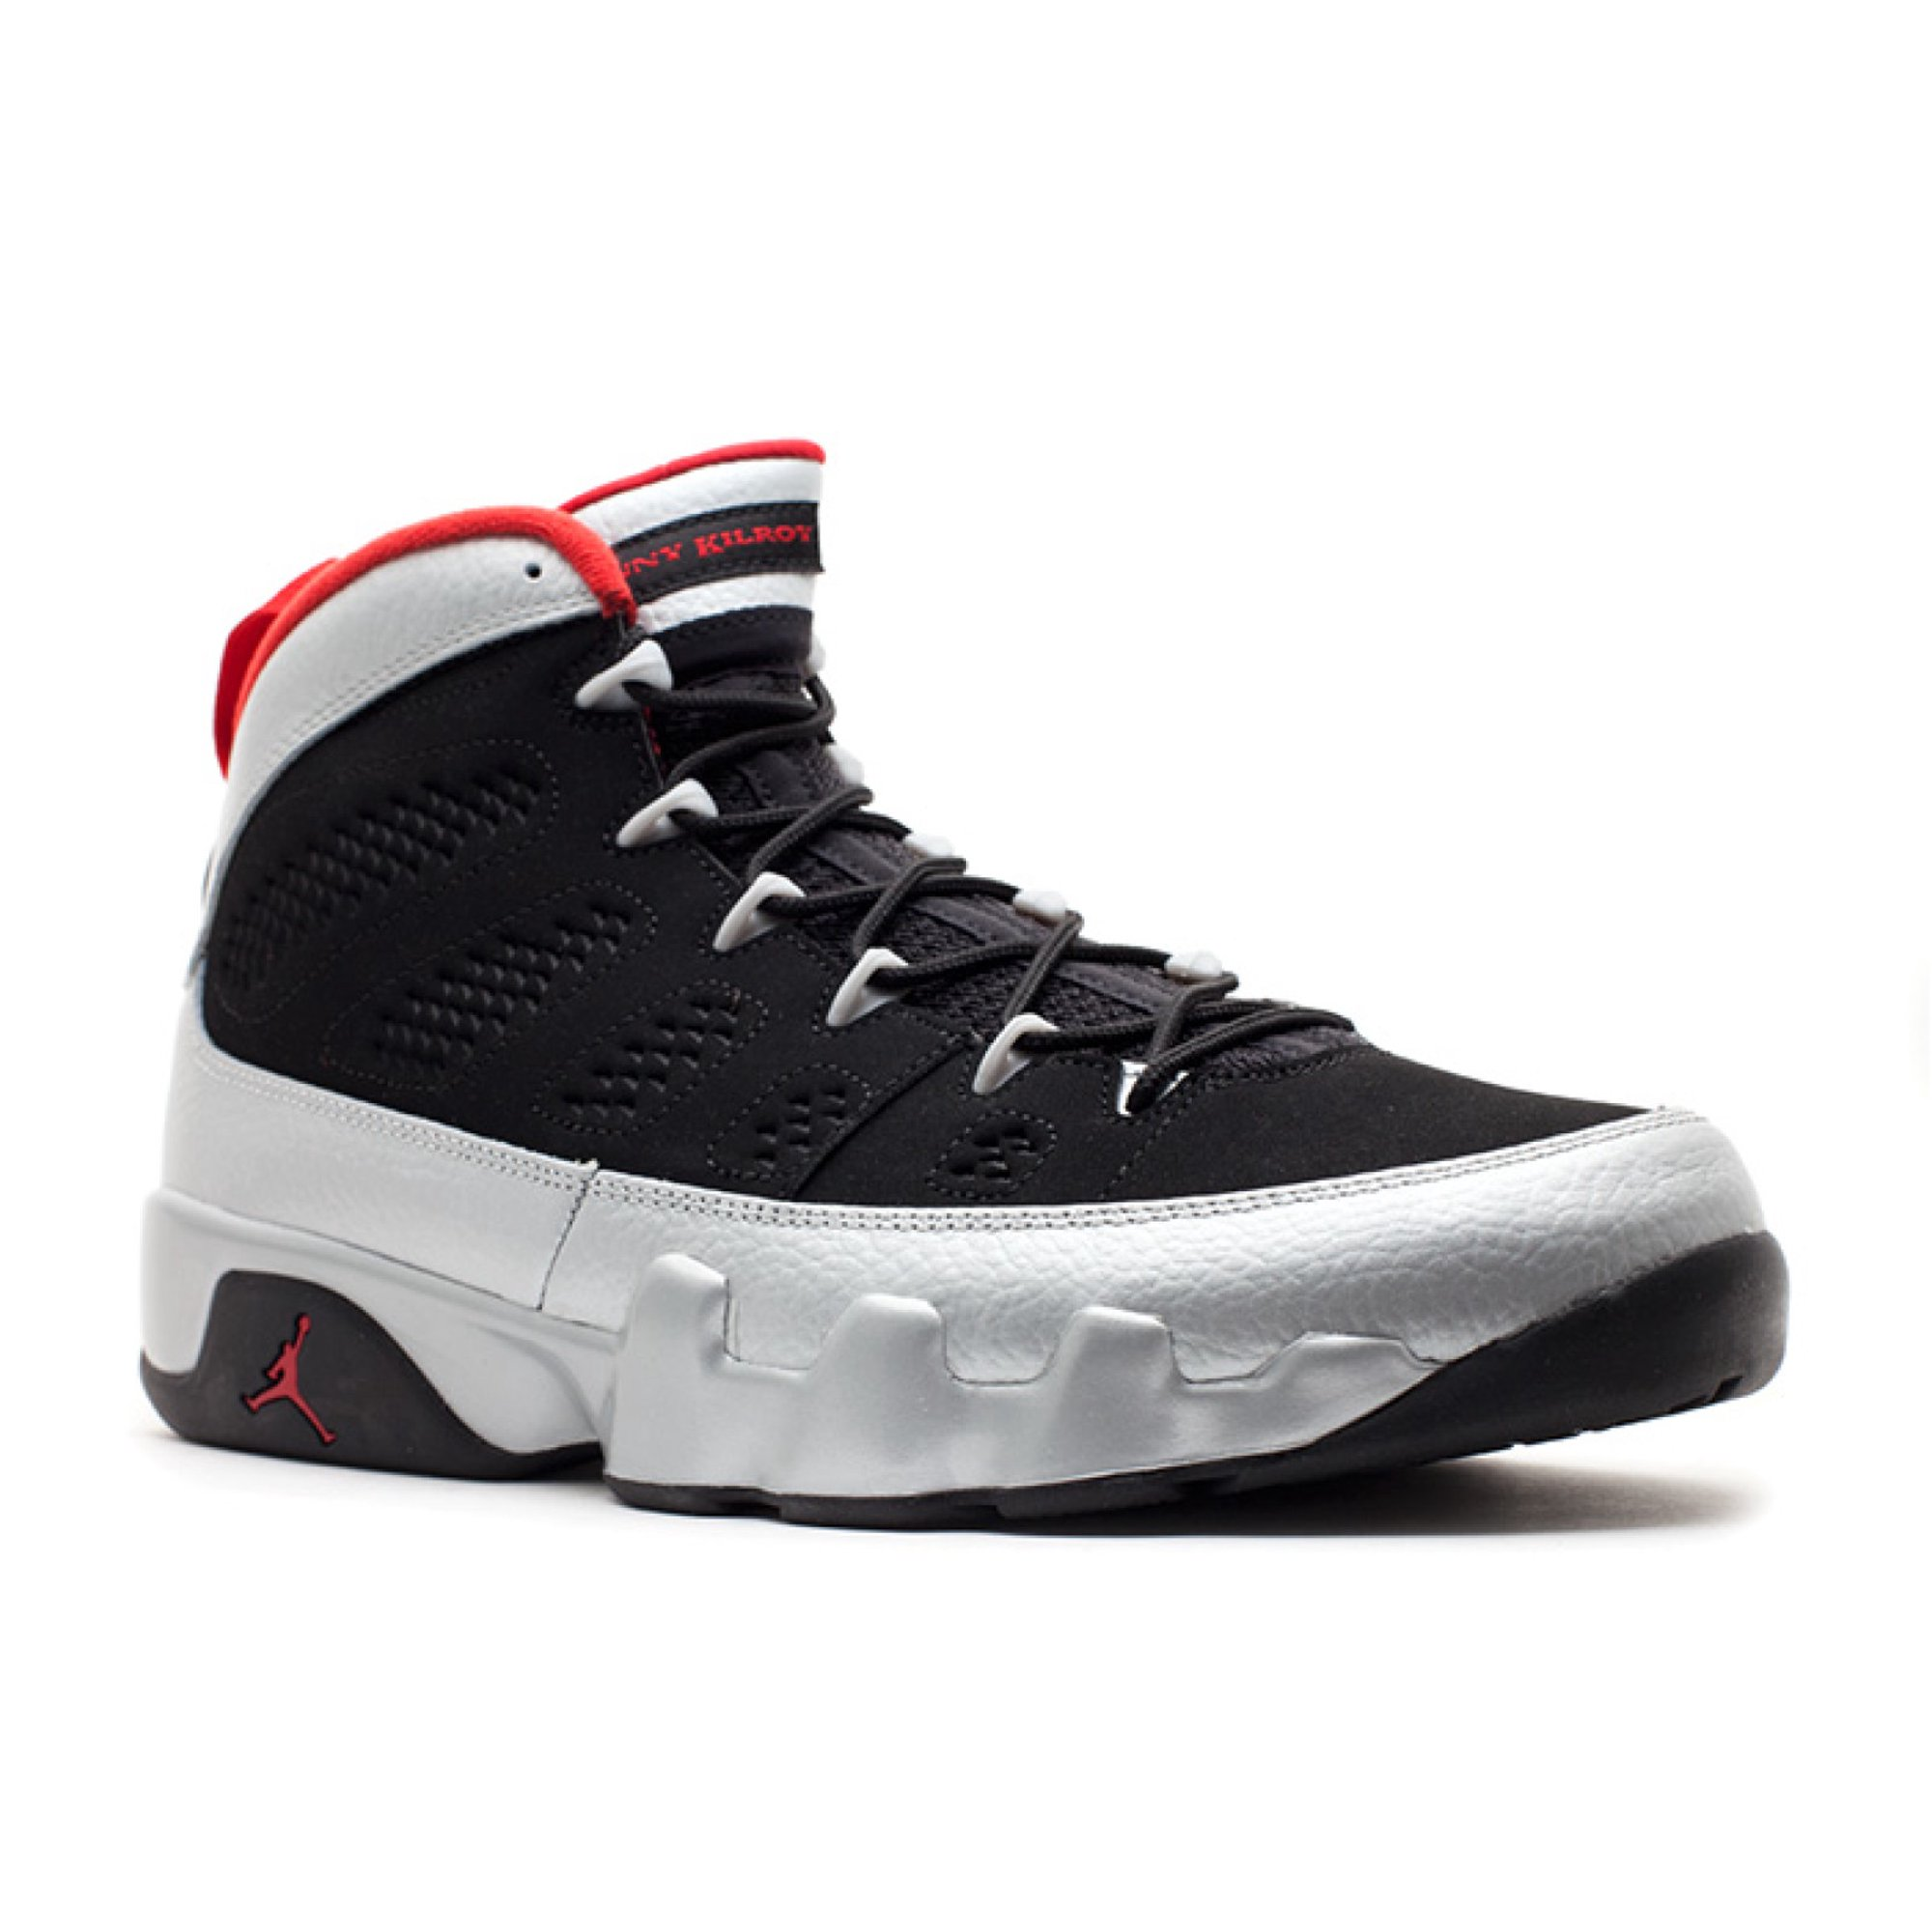 5180a70082a Air Jordan - Men - Air Jordan 9 Retro 'Johhny Kilroy' - 302370-012 - Size  13 | Walmart Canada